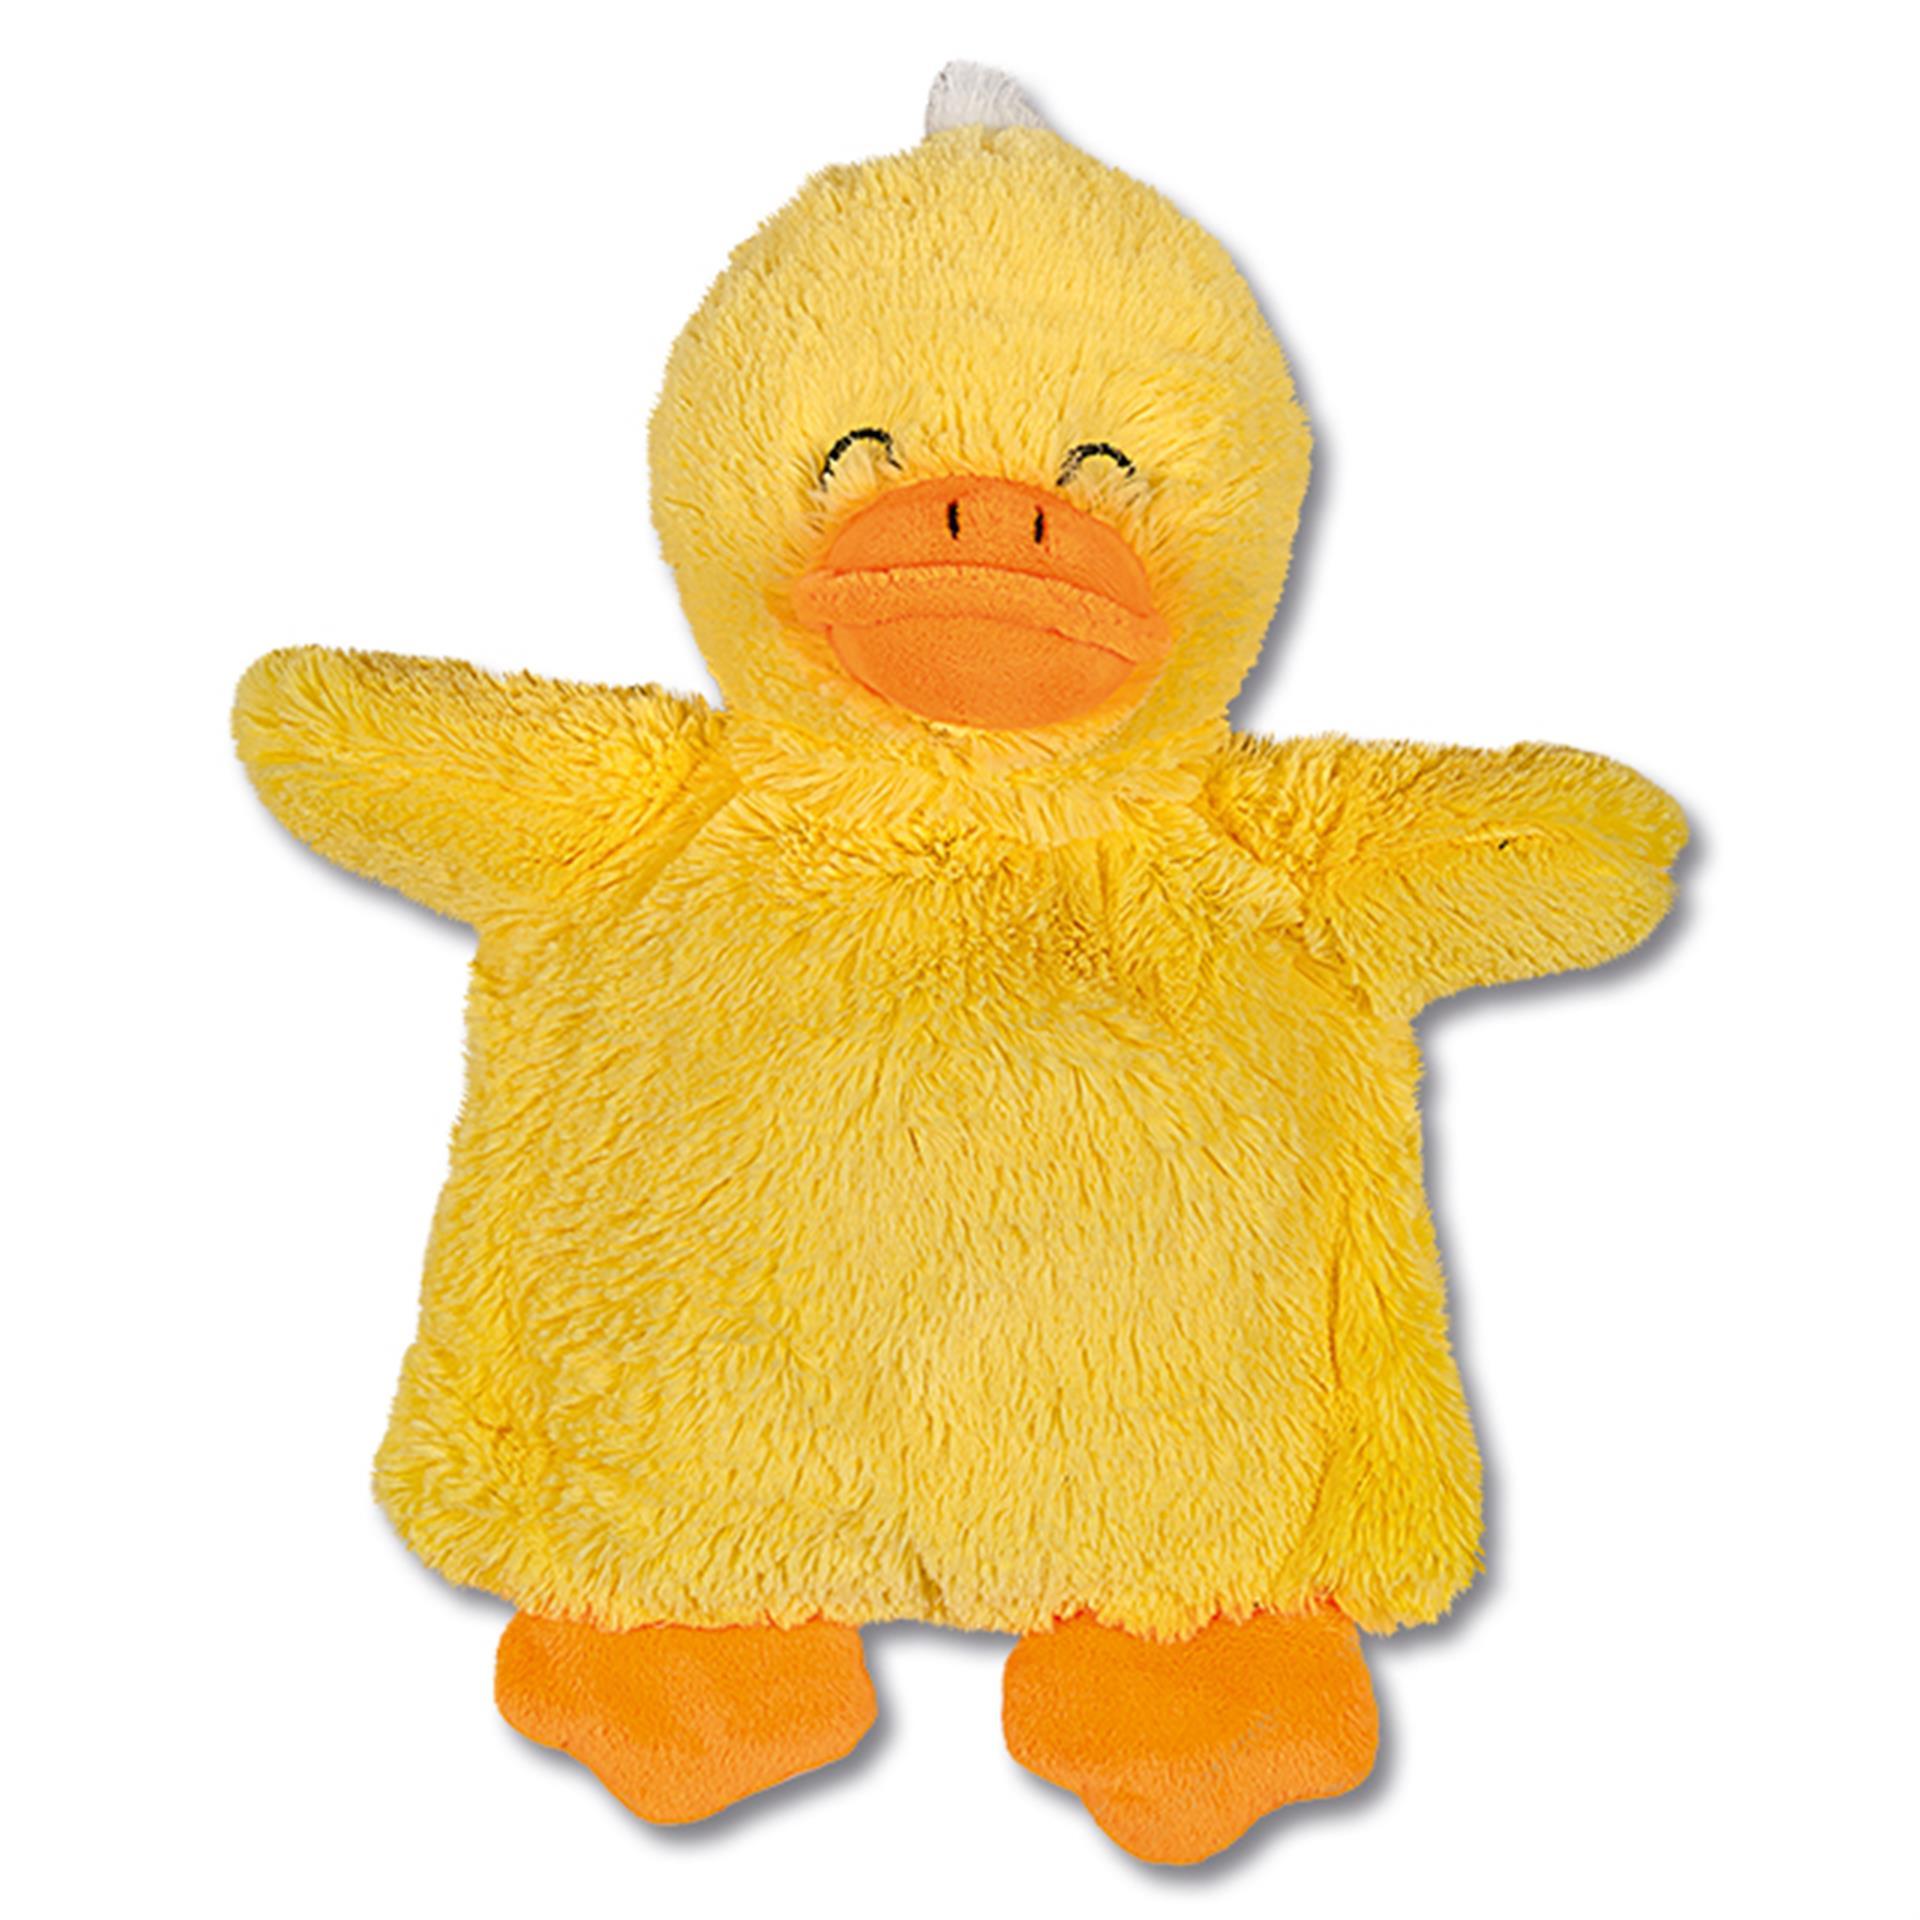 Kirschkernkissen Ente